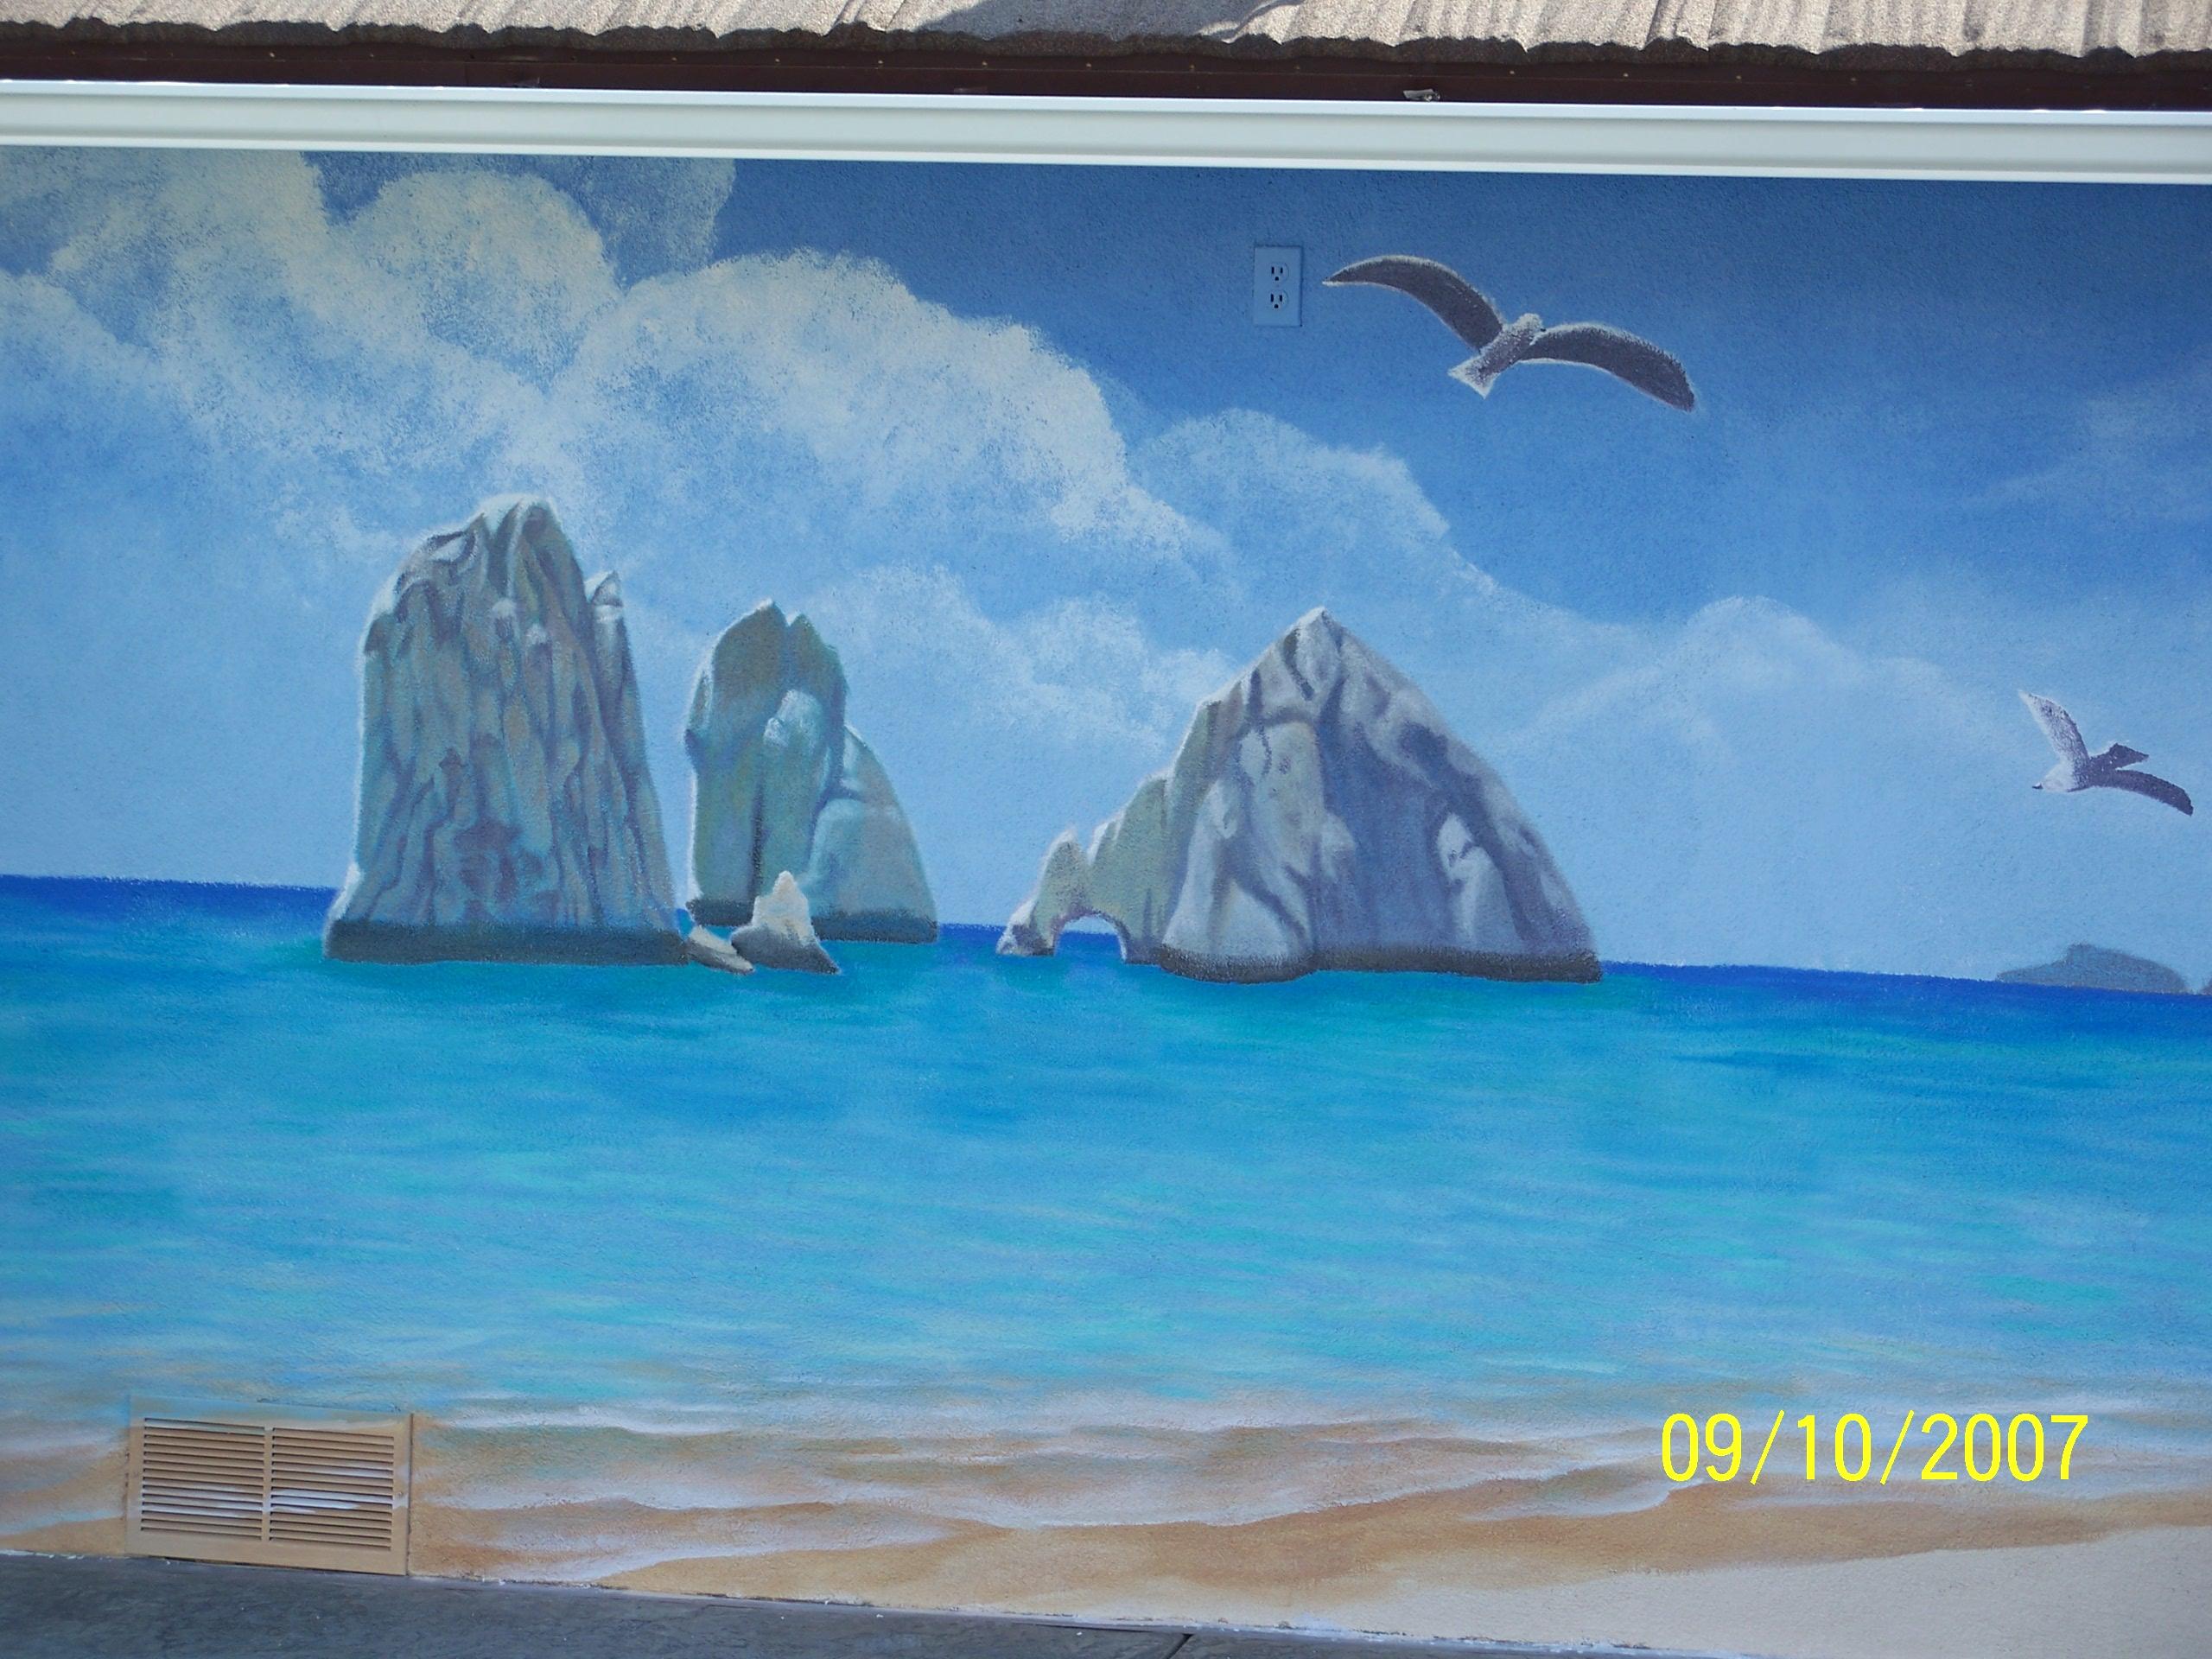 Coronas in Cabo